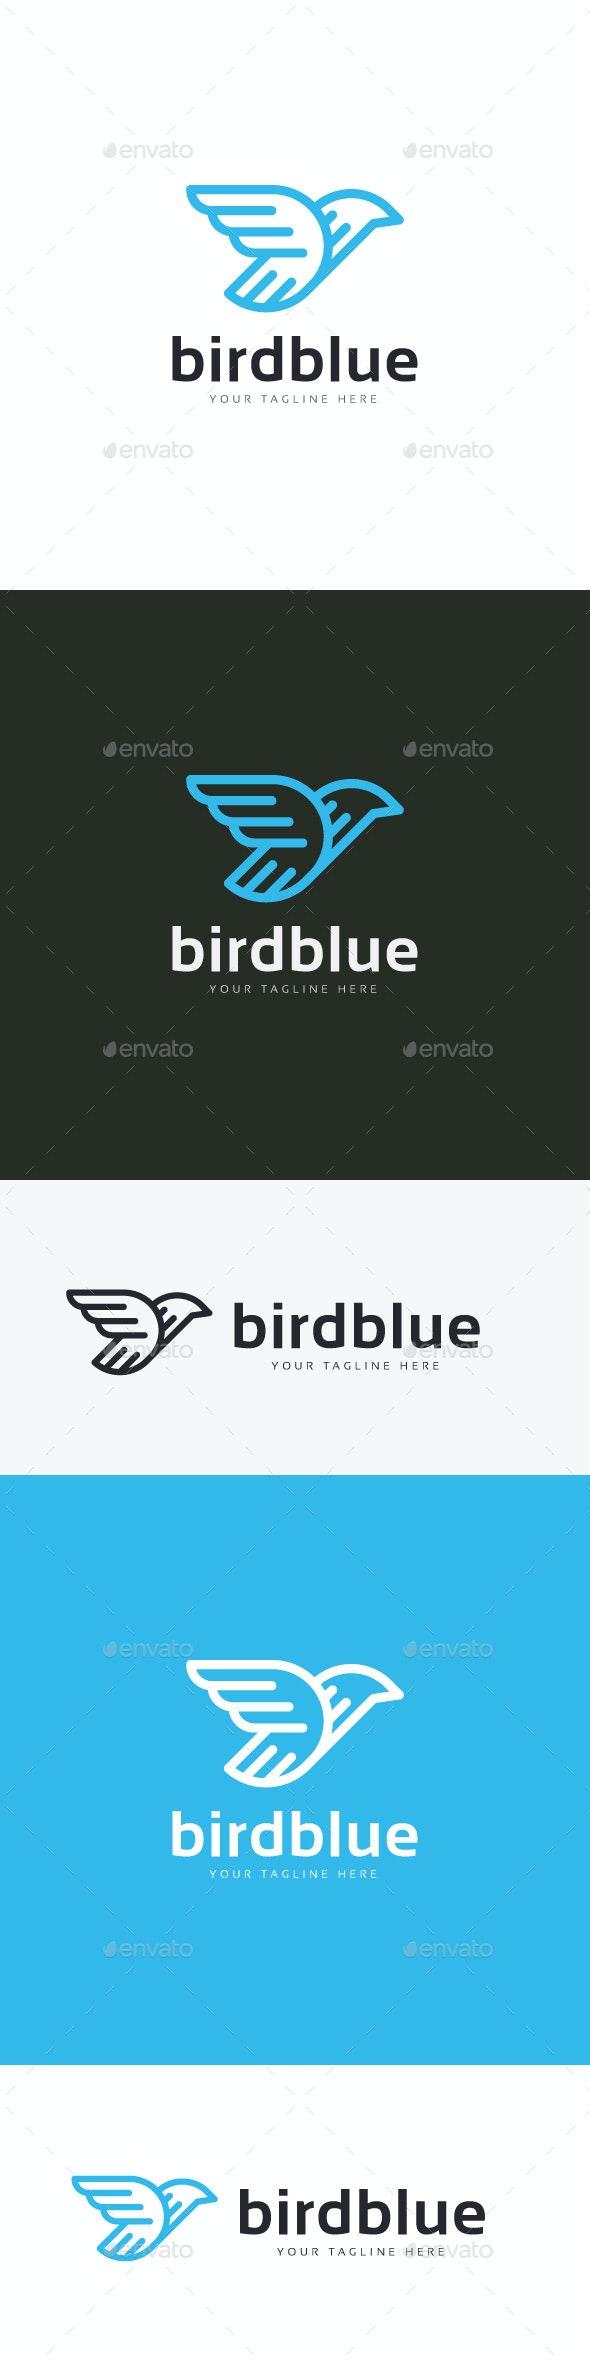 Birdblue Logo - Animals Logo Templates